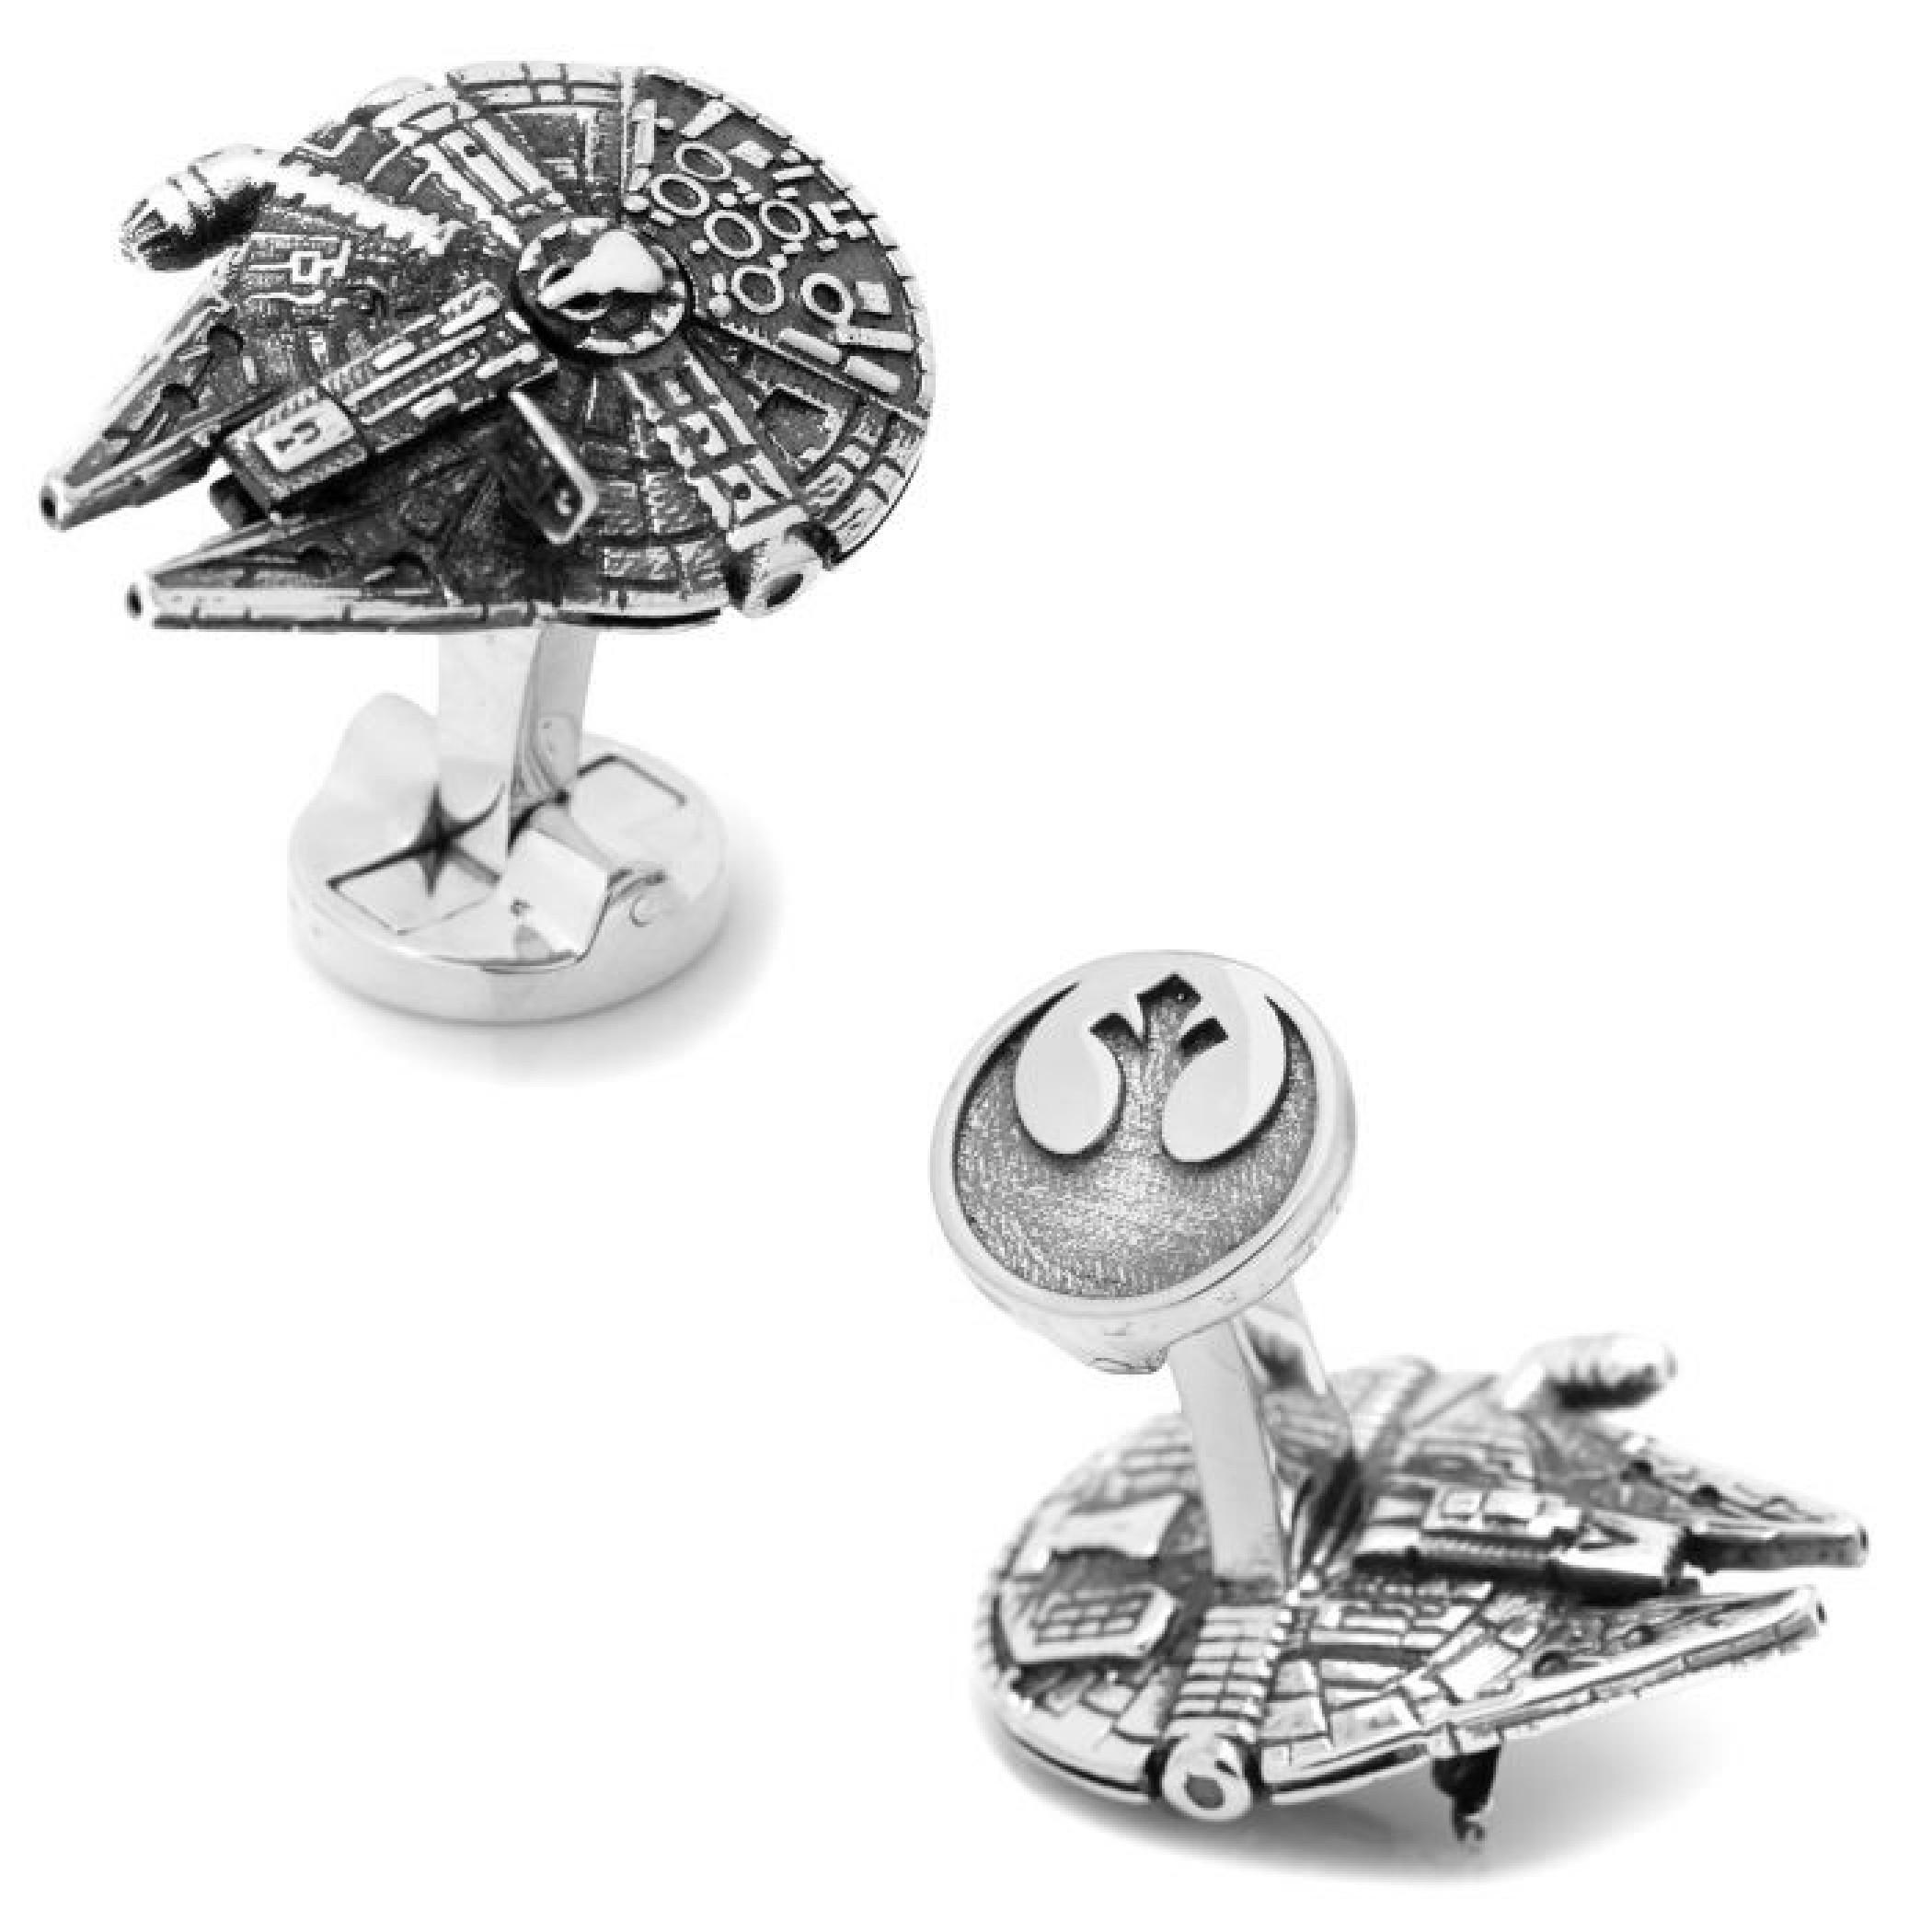 Star Wars 3D Millennium Falcon Cufflinks